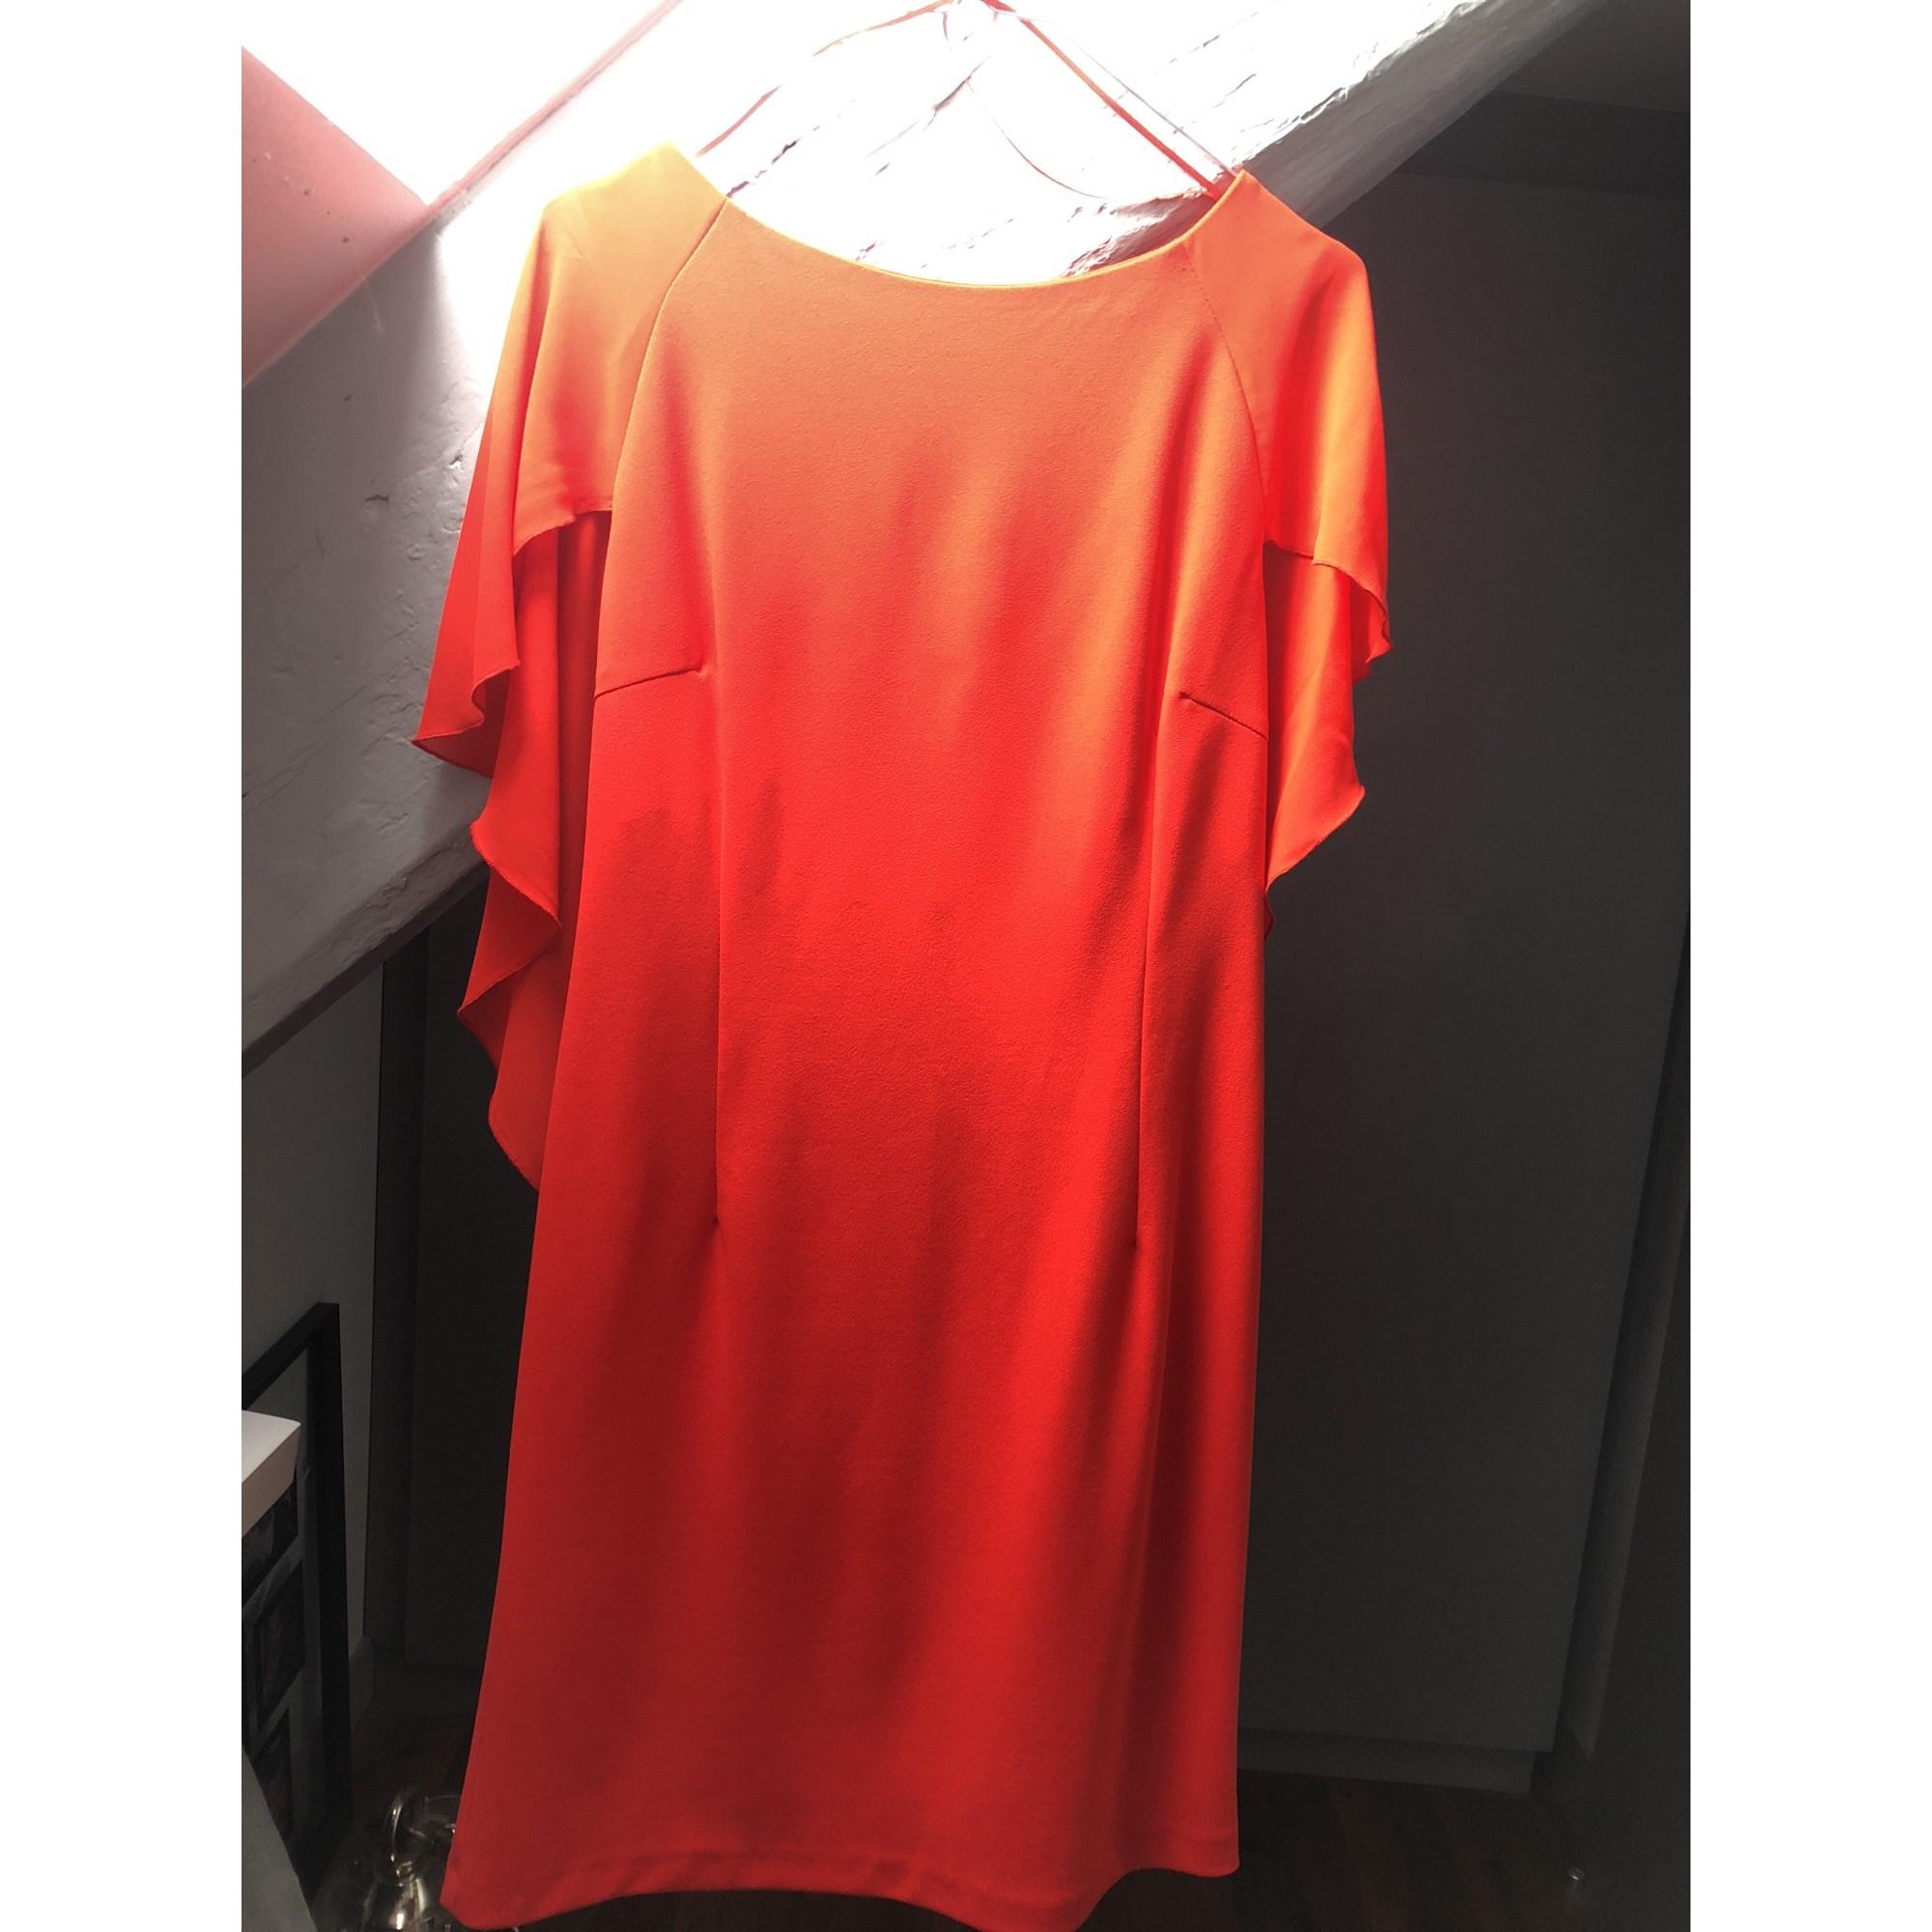 39a880804837 Robe courte RINASCIMENTO 38 (M, T2) rouge - 8122062